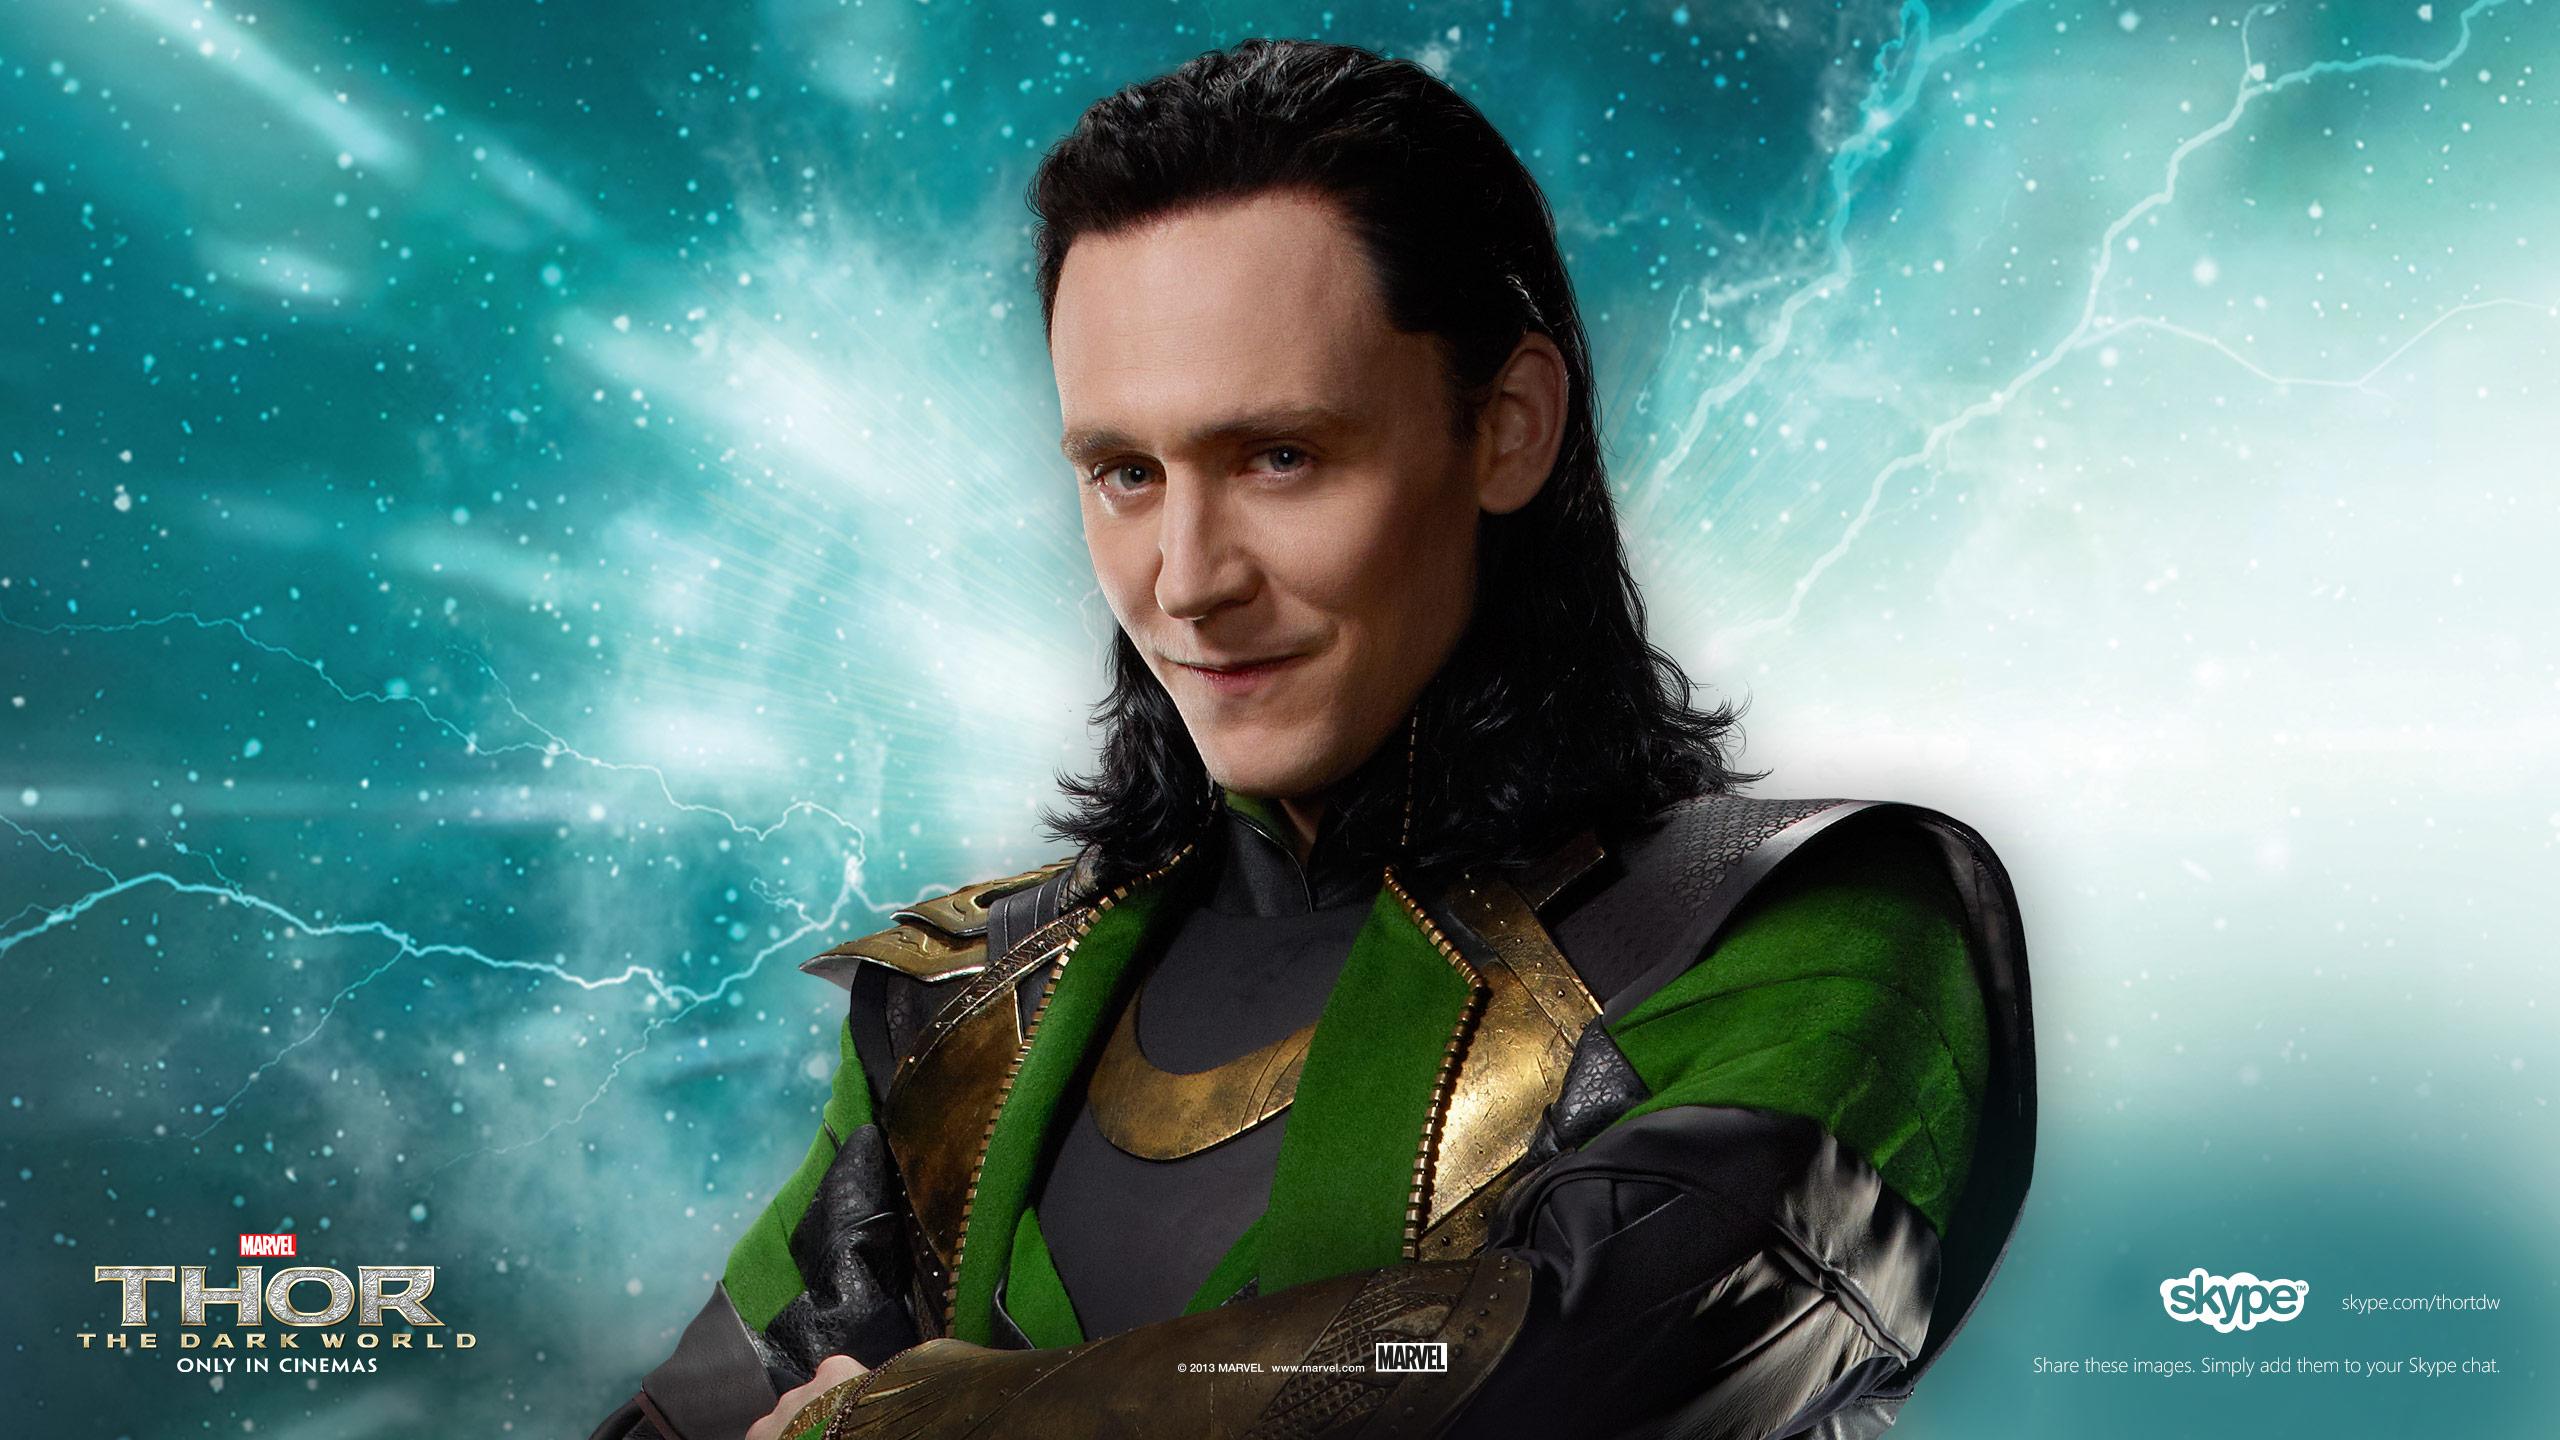 2560x1440 Desktop Wallpaper Loki 2560x1440